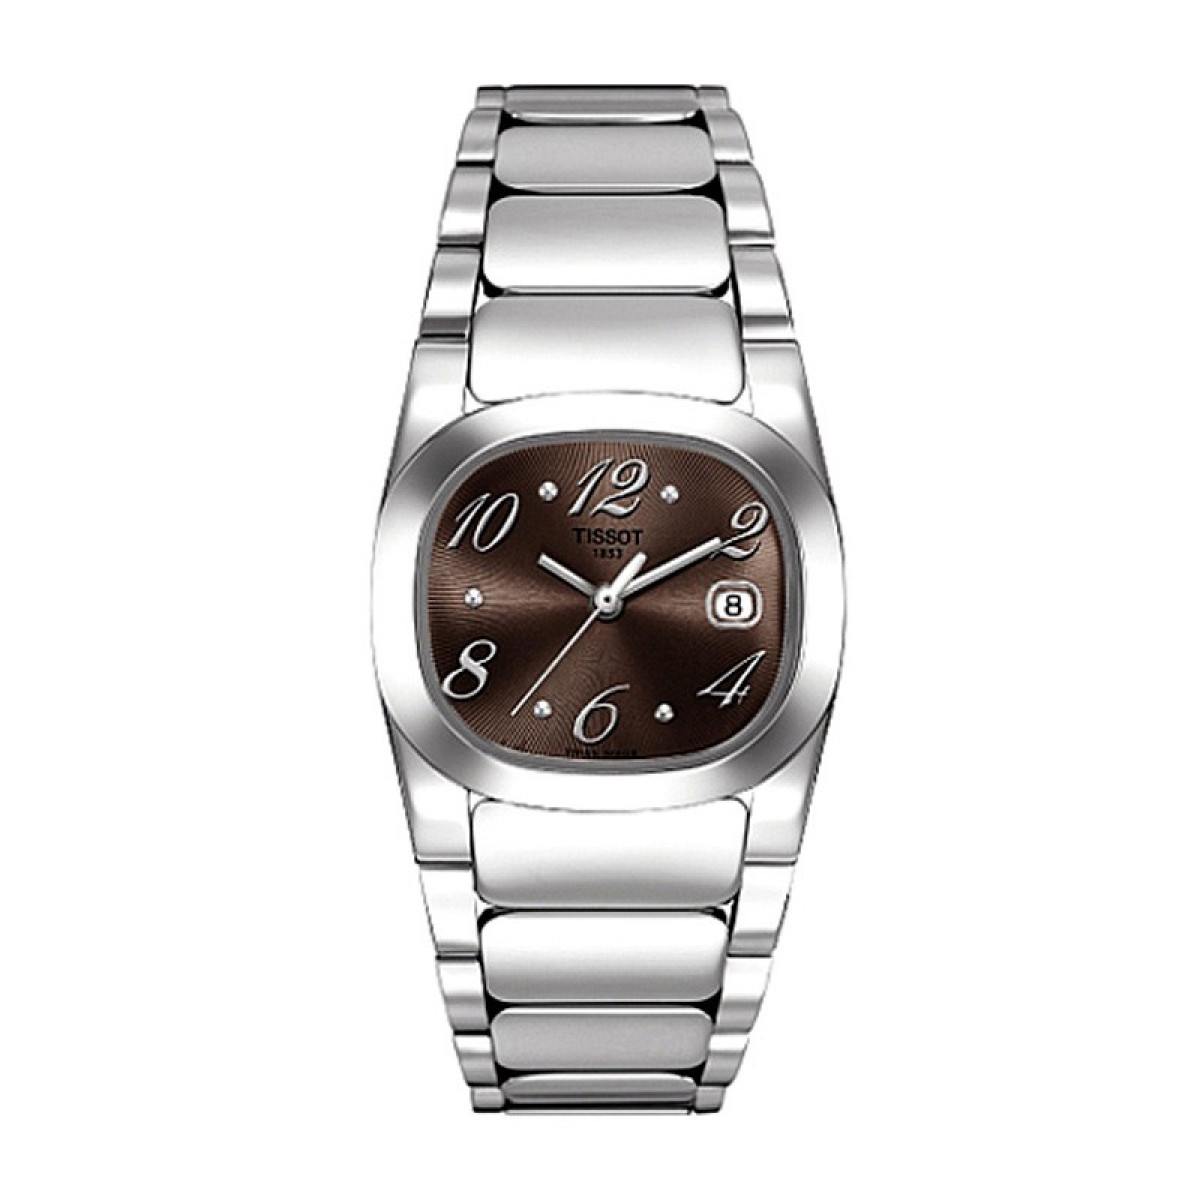 Часовник Tissot T009.110.11.297.00